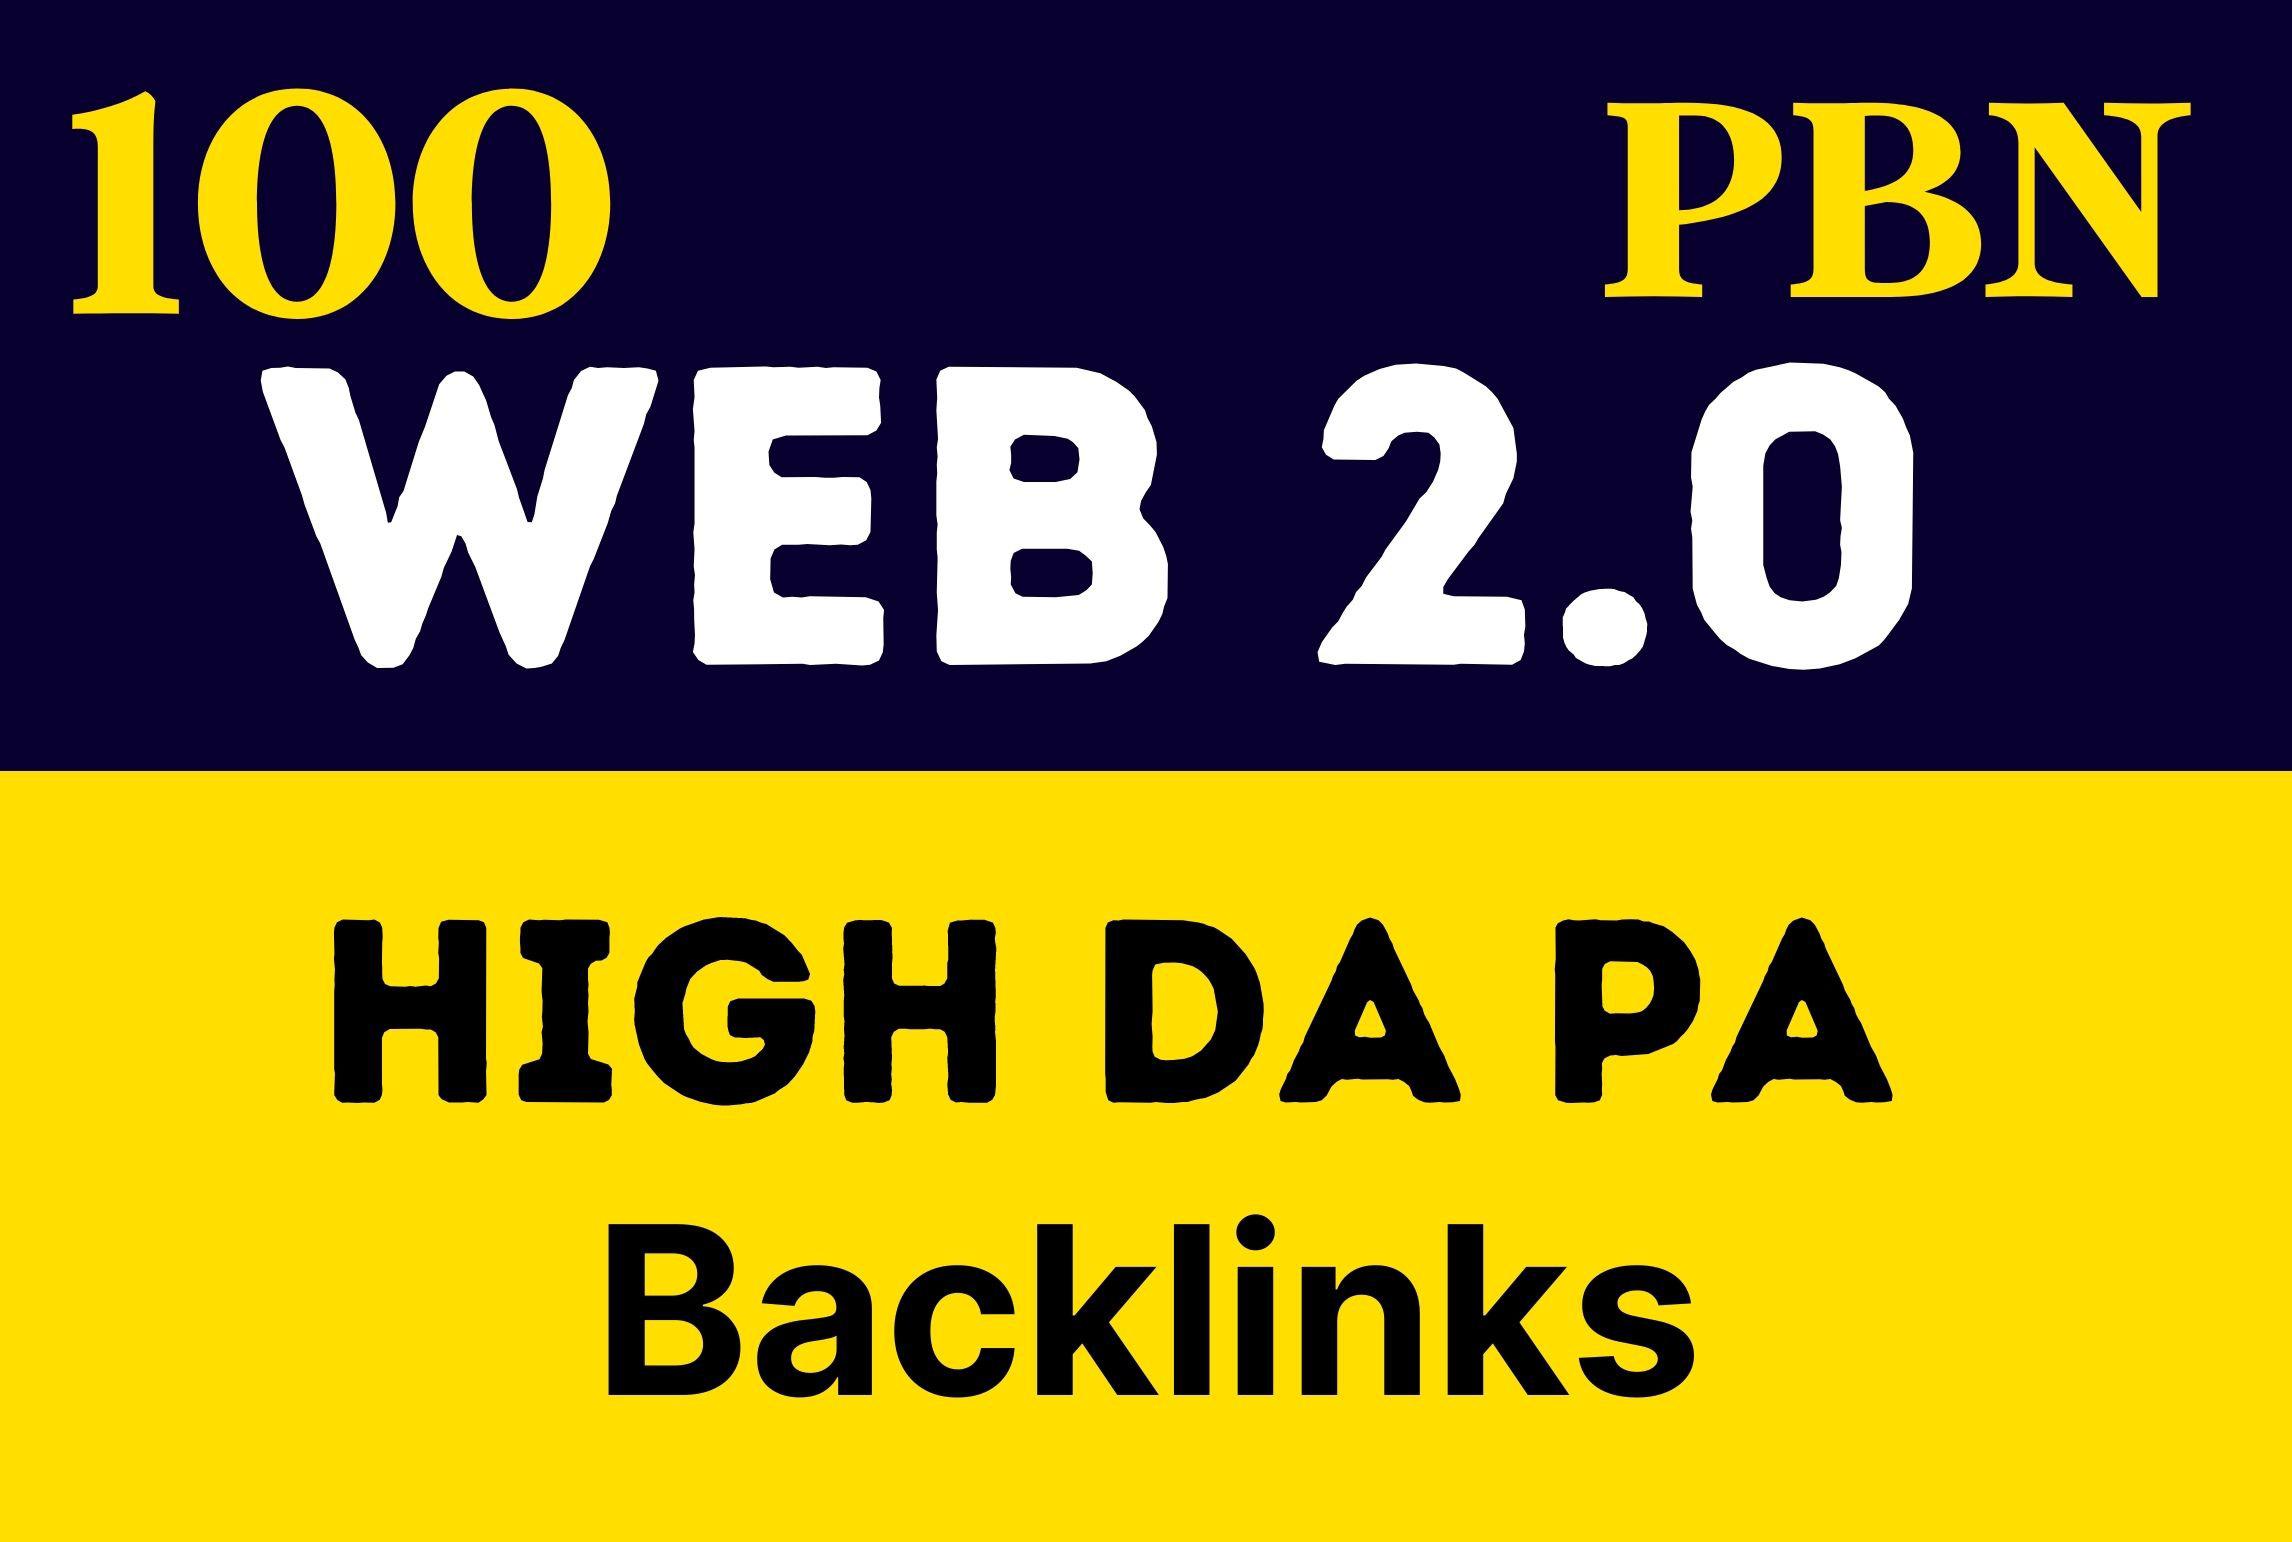 Premium Handmade 100 Unique Web 2.0 PBN Backlinks